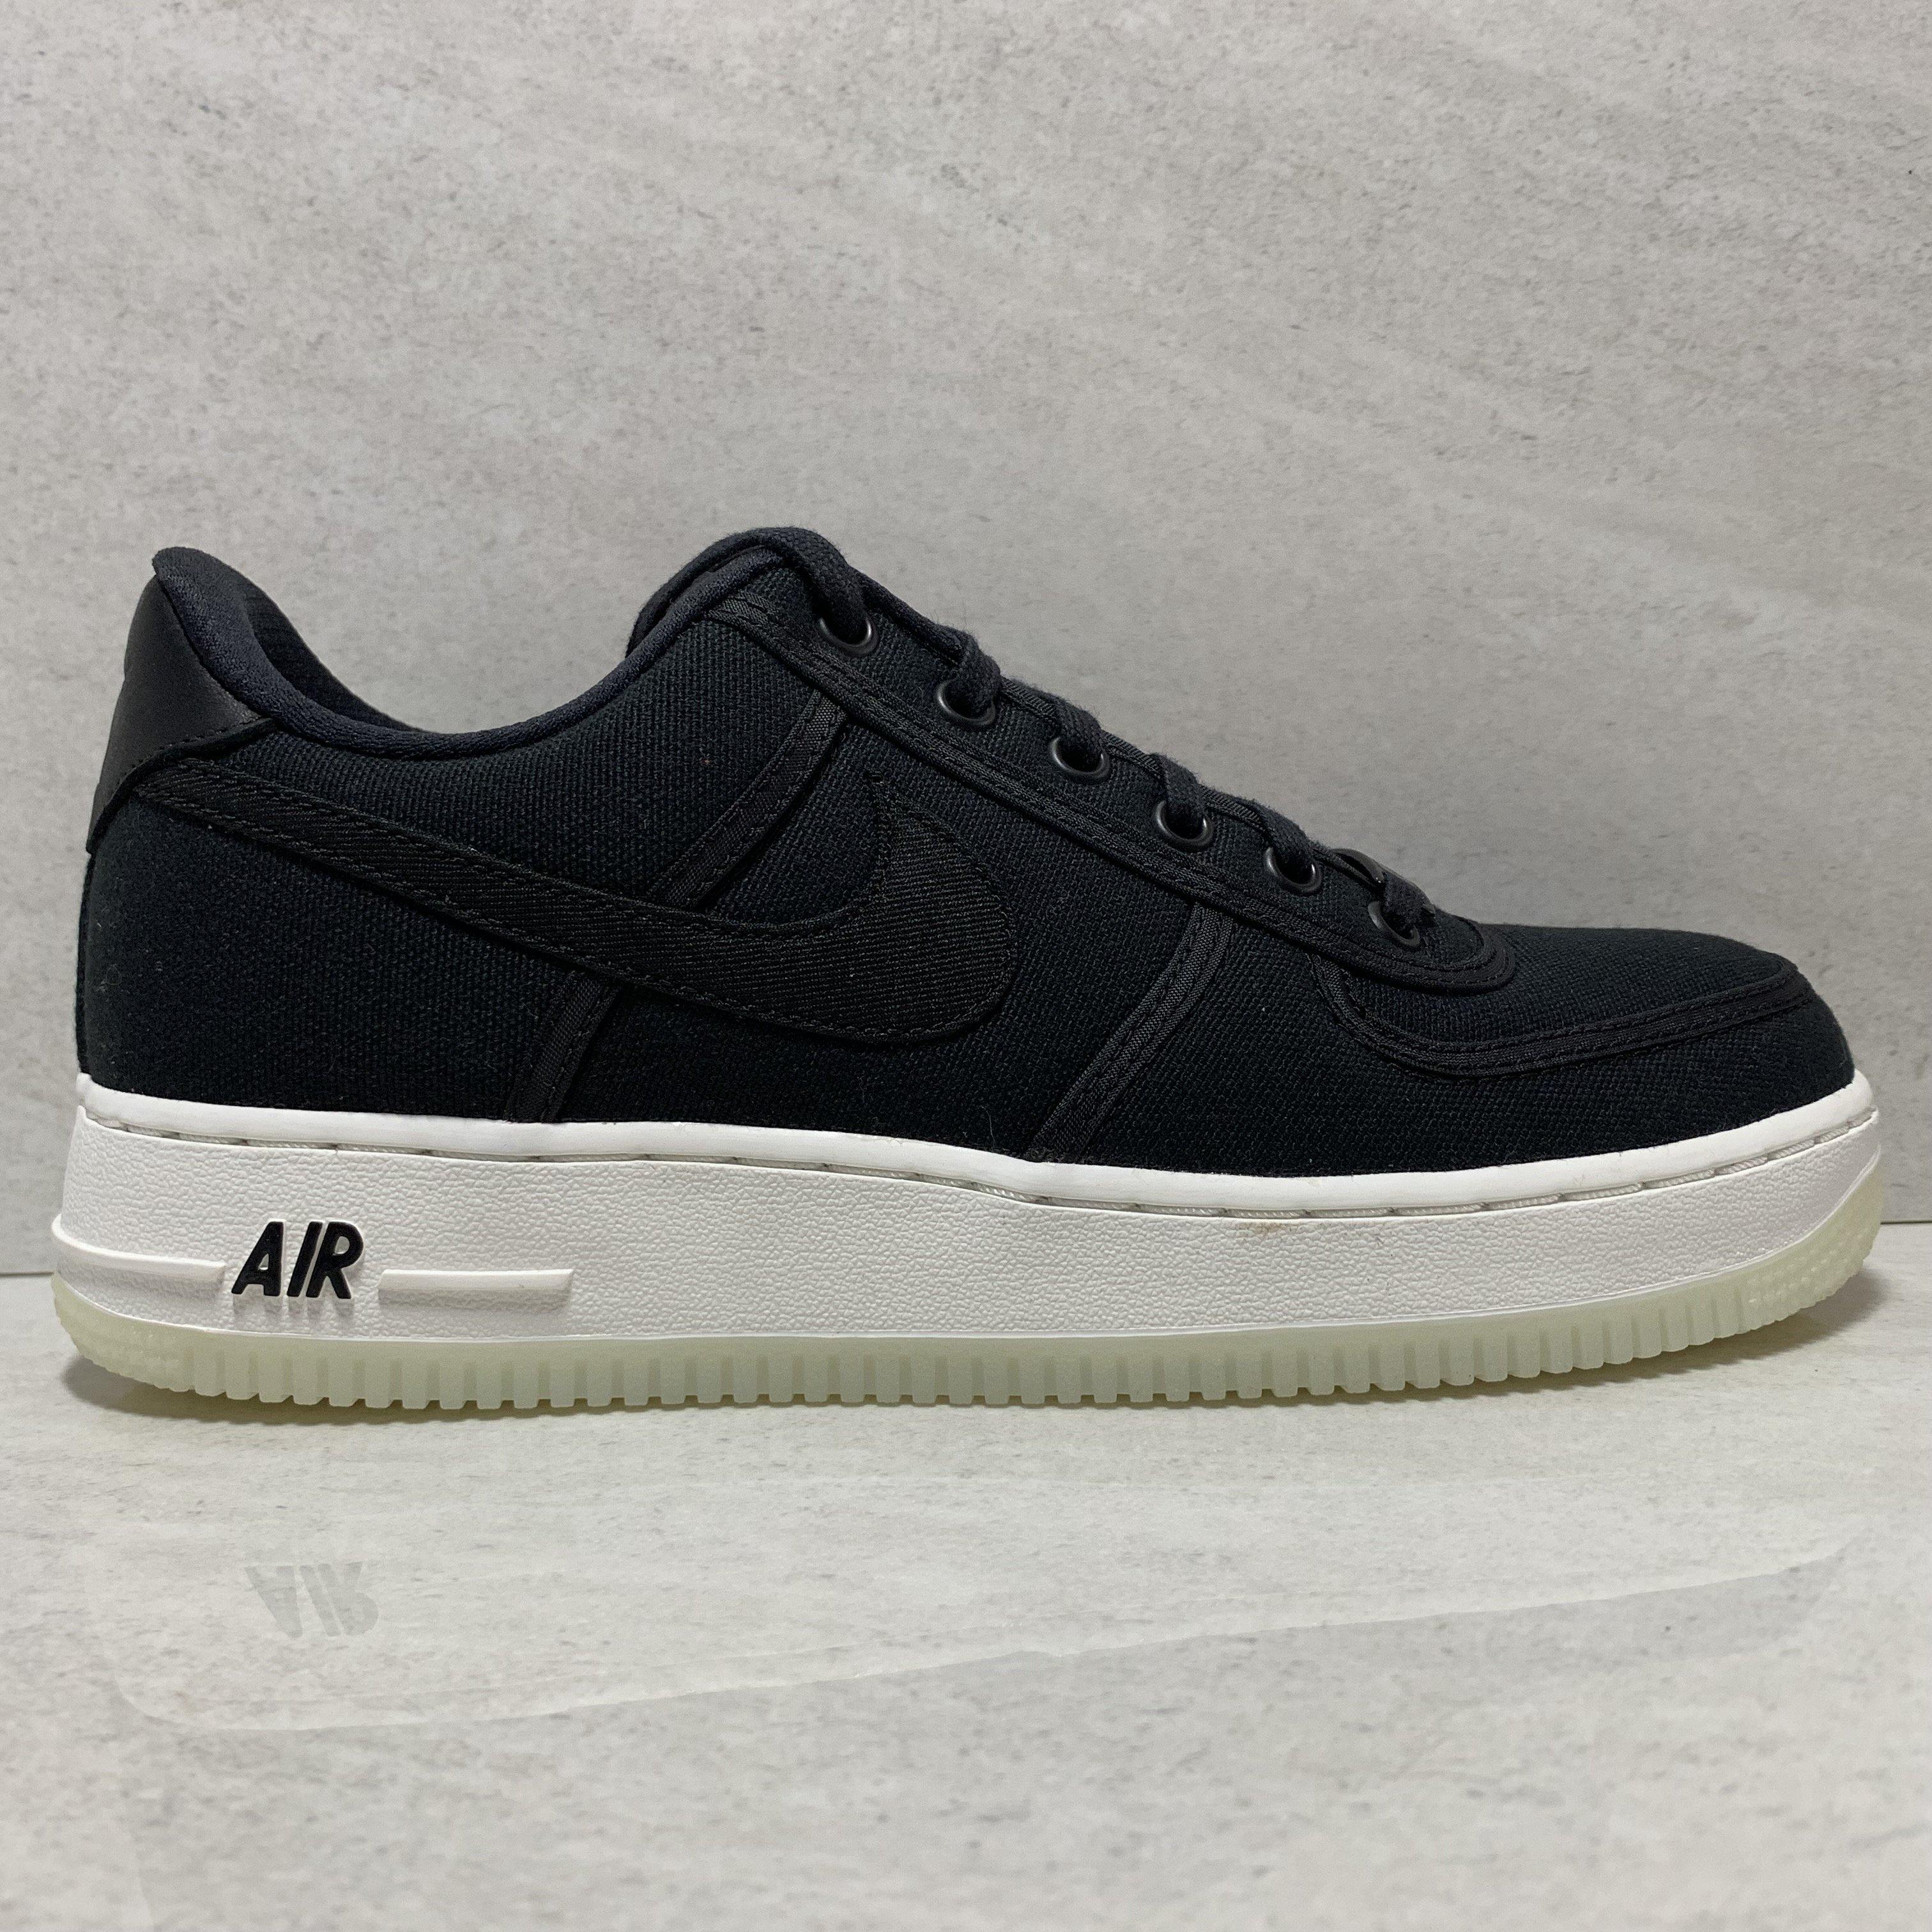 Nike air force 1 low retro qs size 7.5 black canvas ah1067